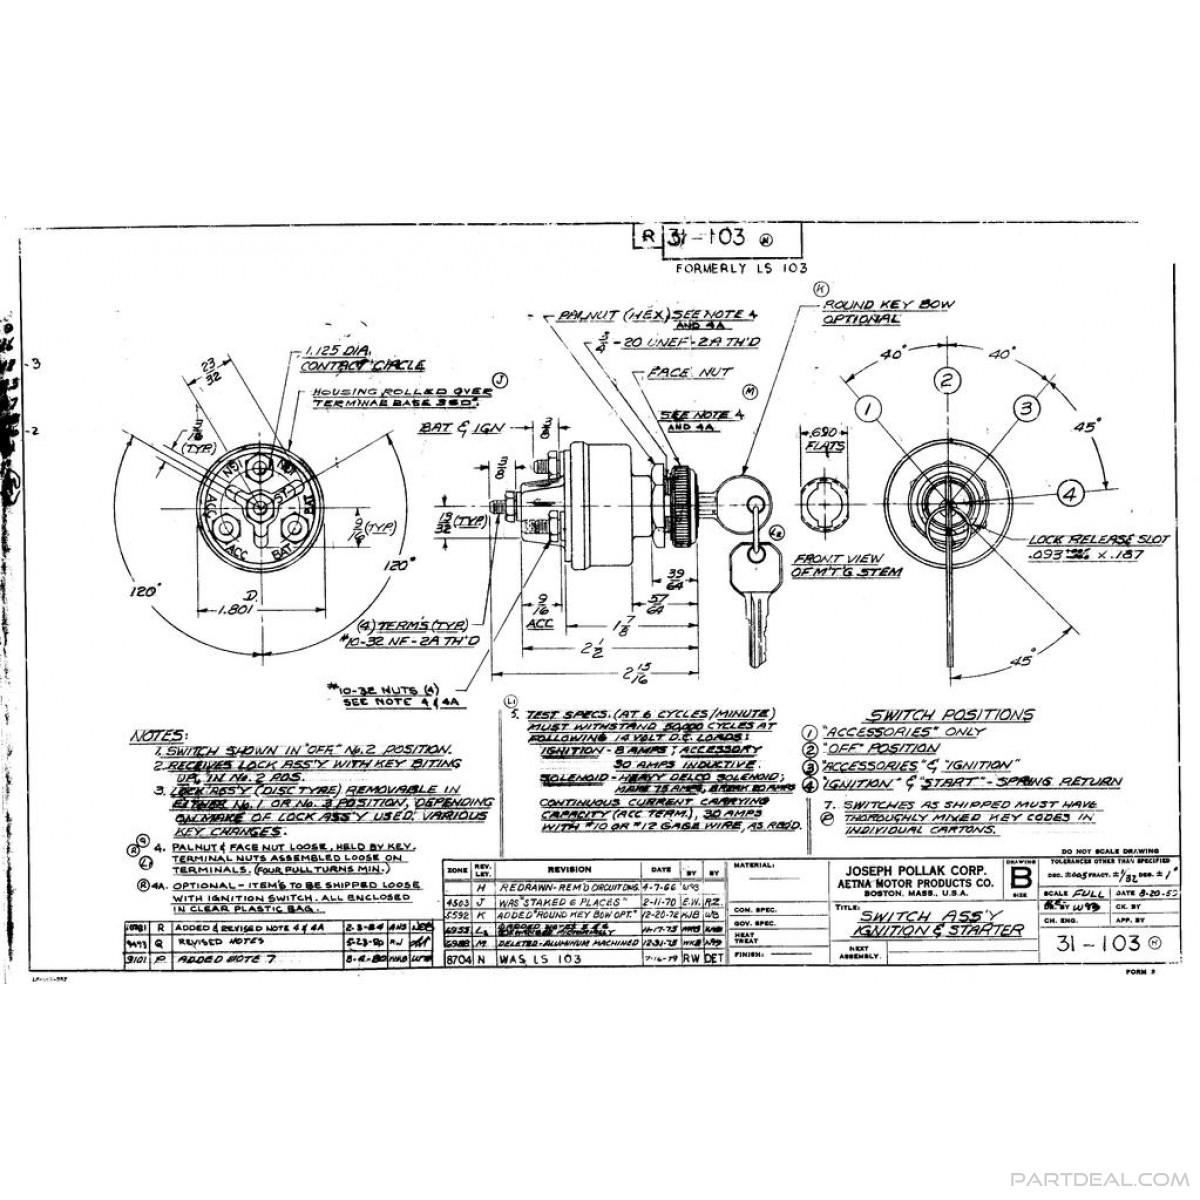 OT_6579] Pollak Ignition Switch Diagram Download DiagramItis Stre Over Marki Xolia Mohammedshrine Librar Wiring 101